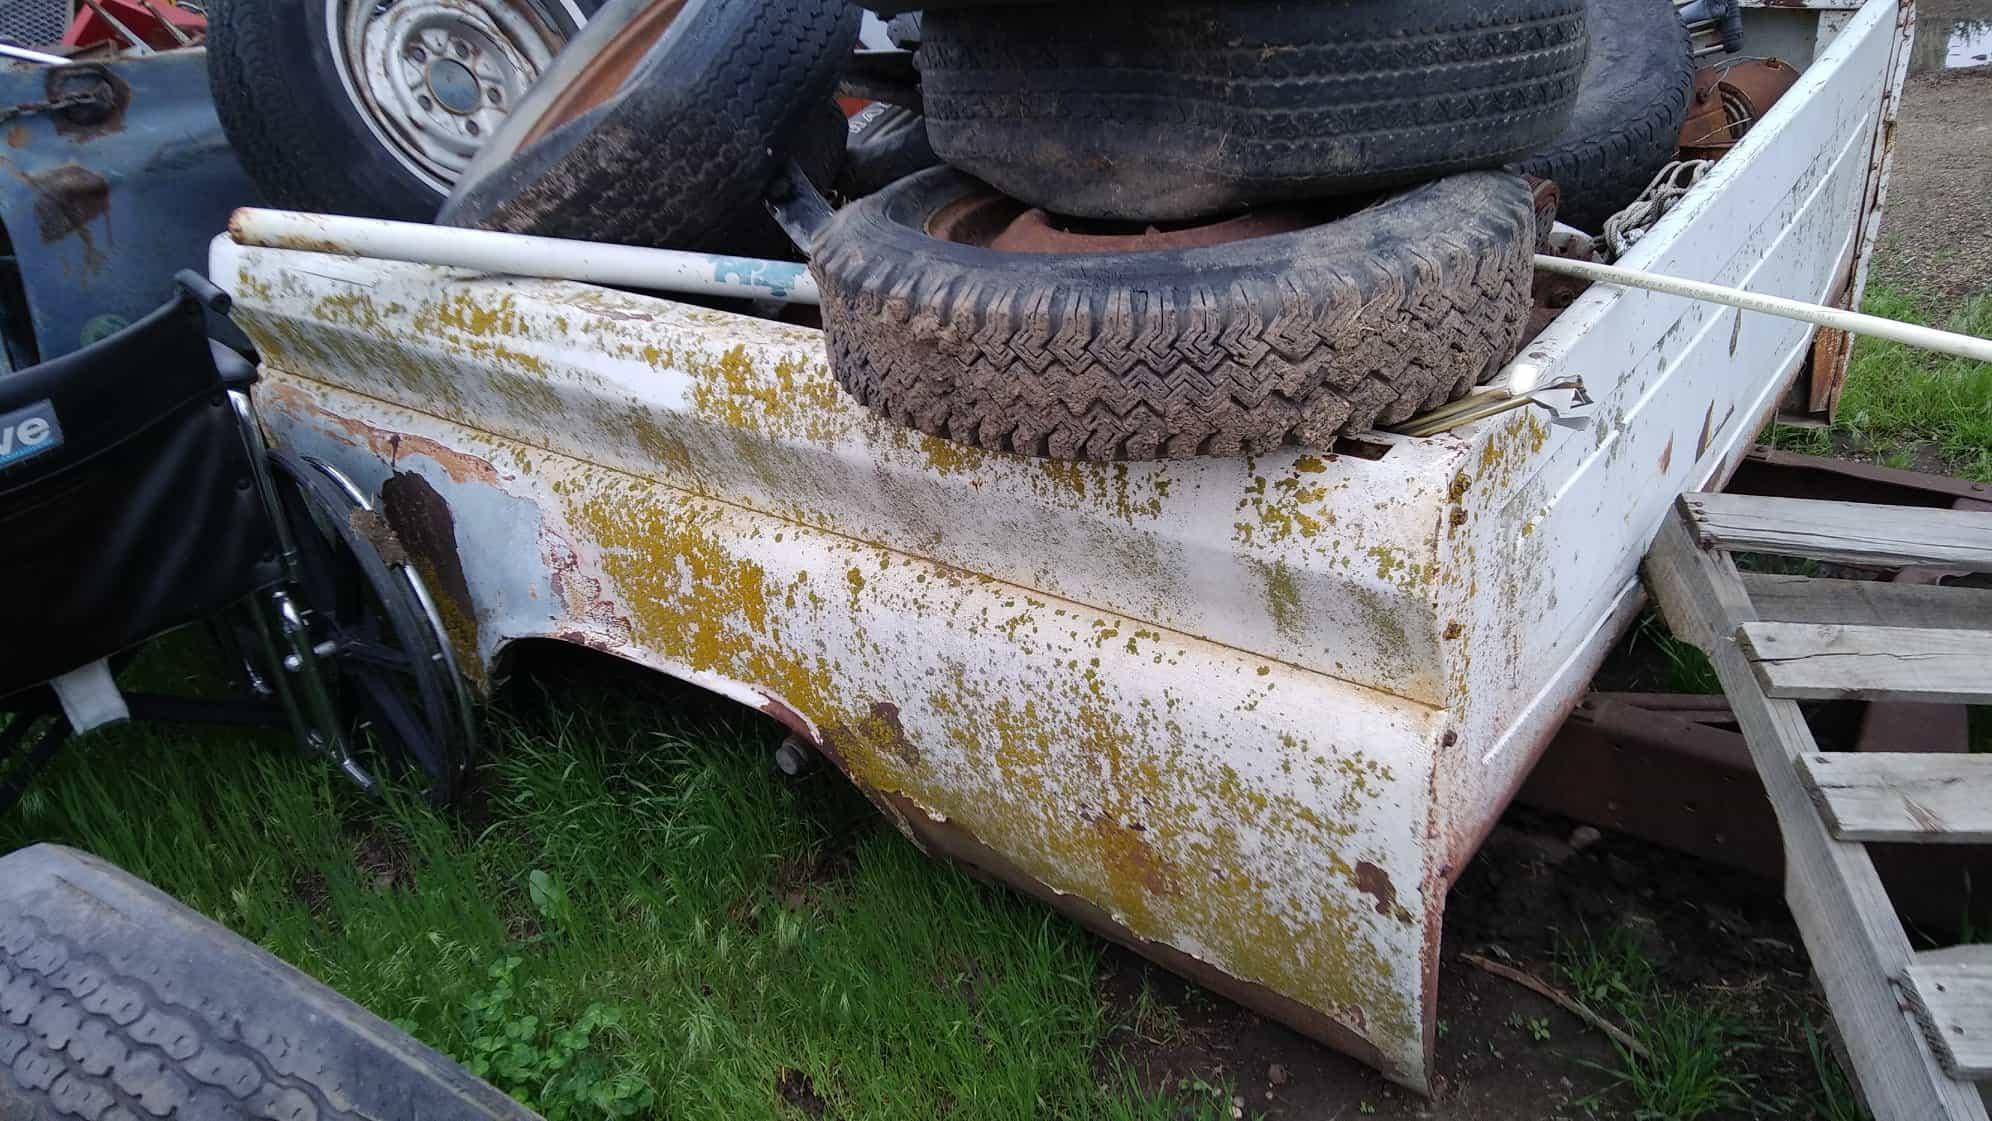 Classic Truck Beds For Sale in Harvard, Nebraska -03